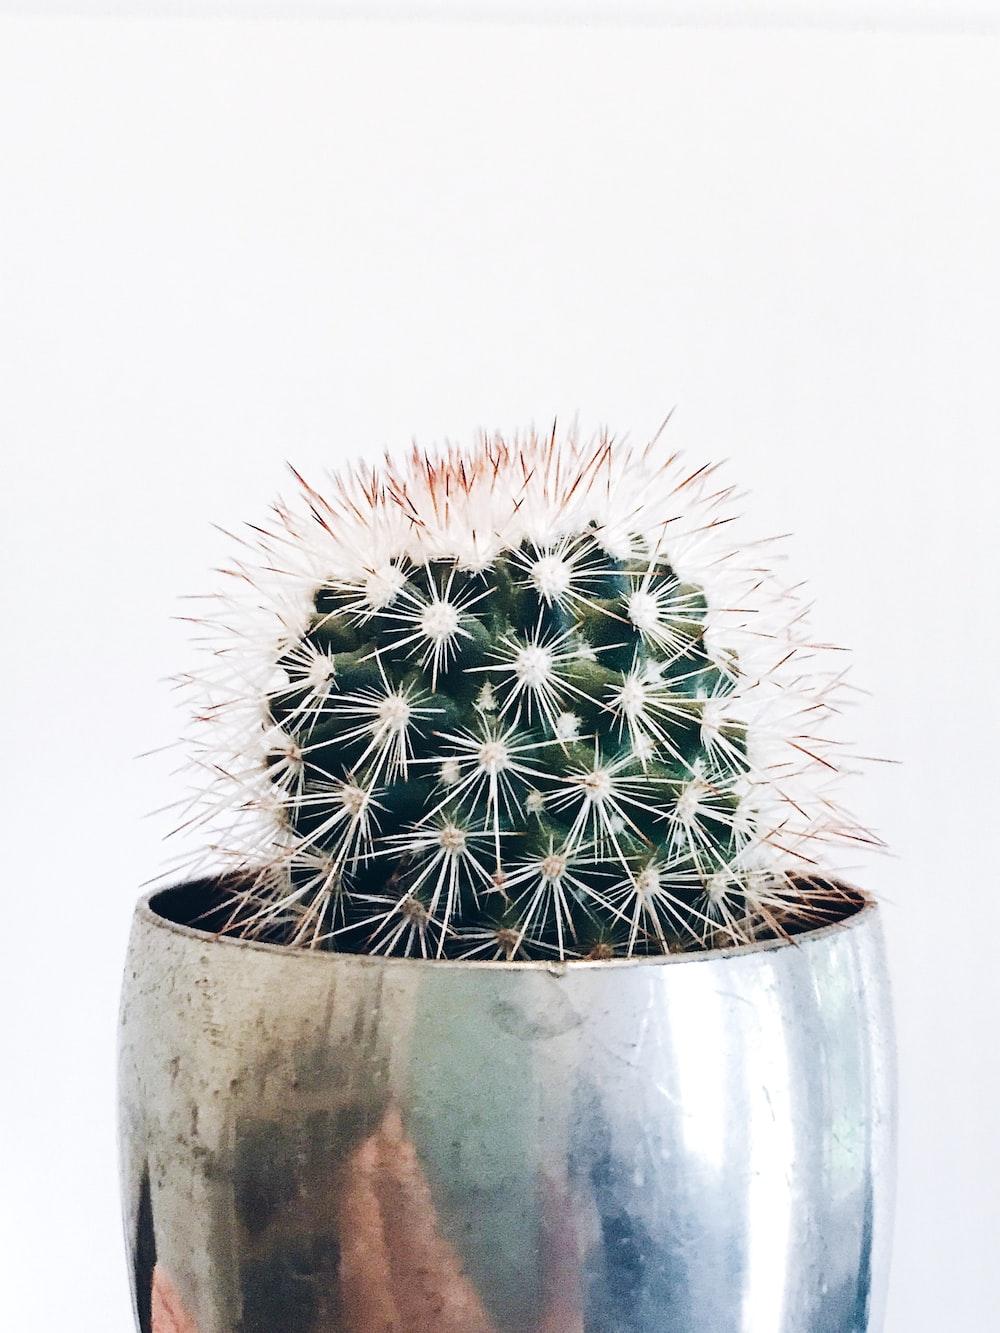 green cactus in gray pot